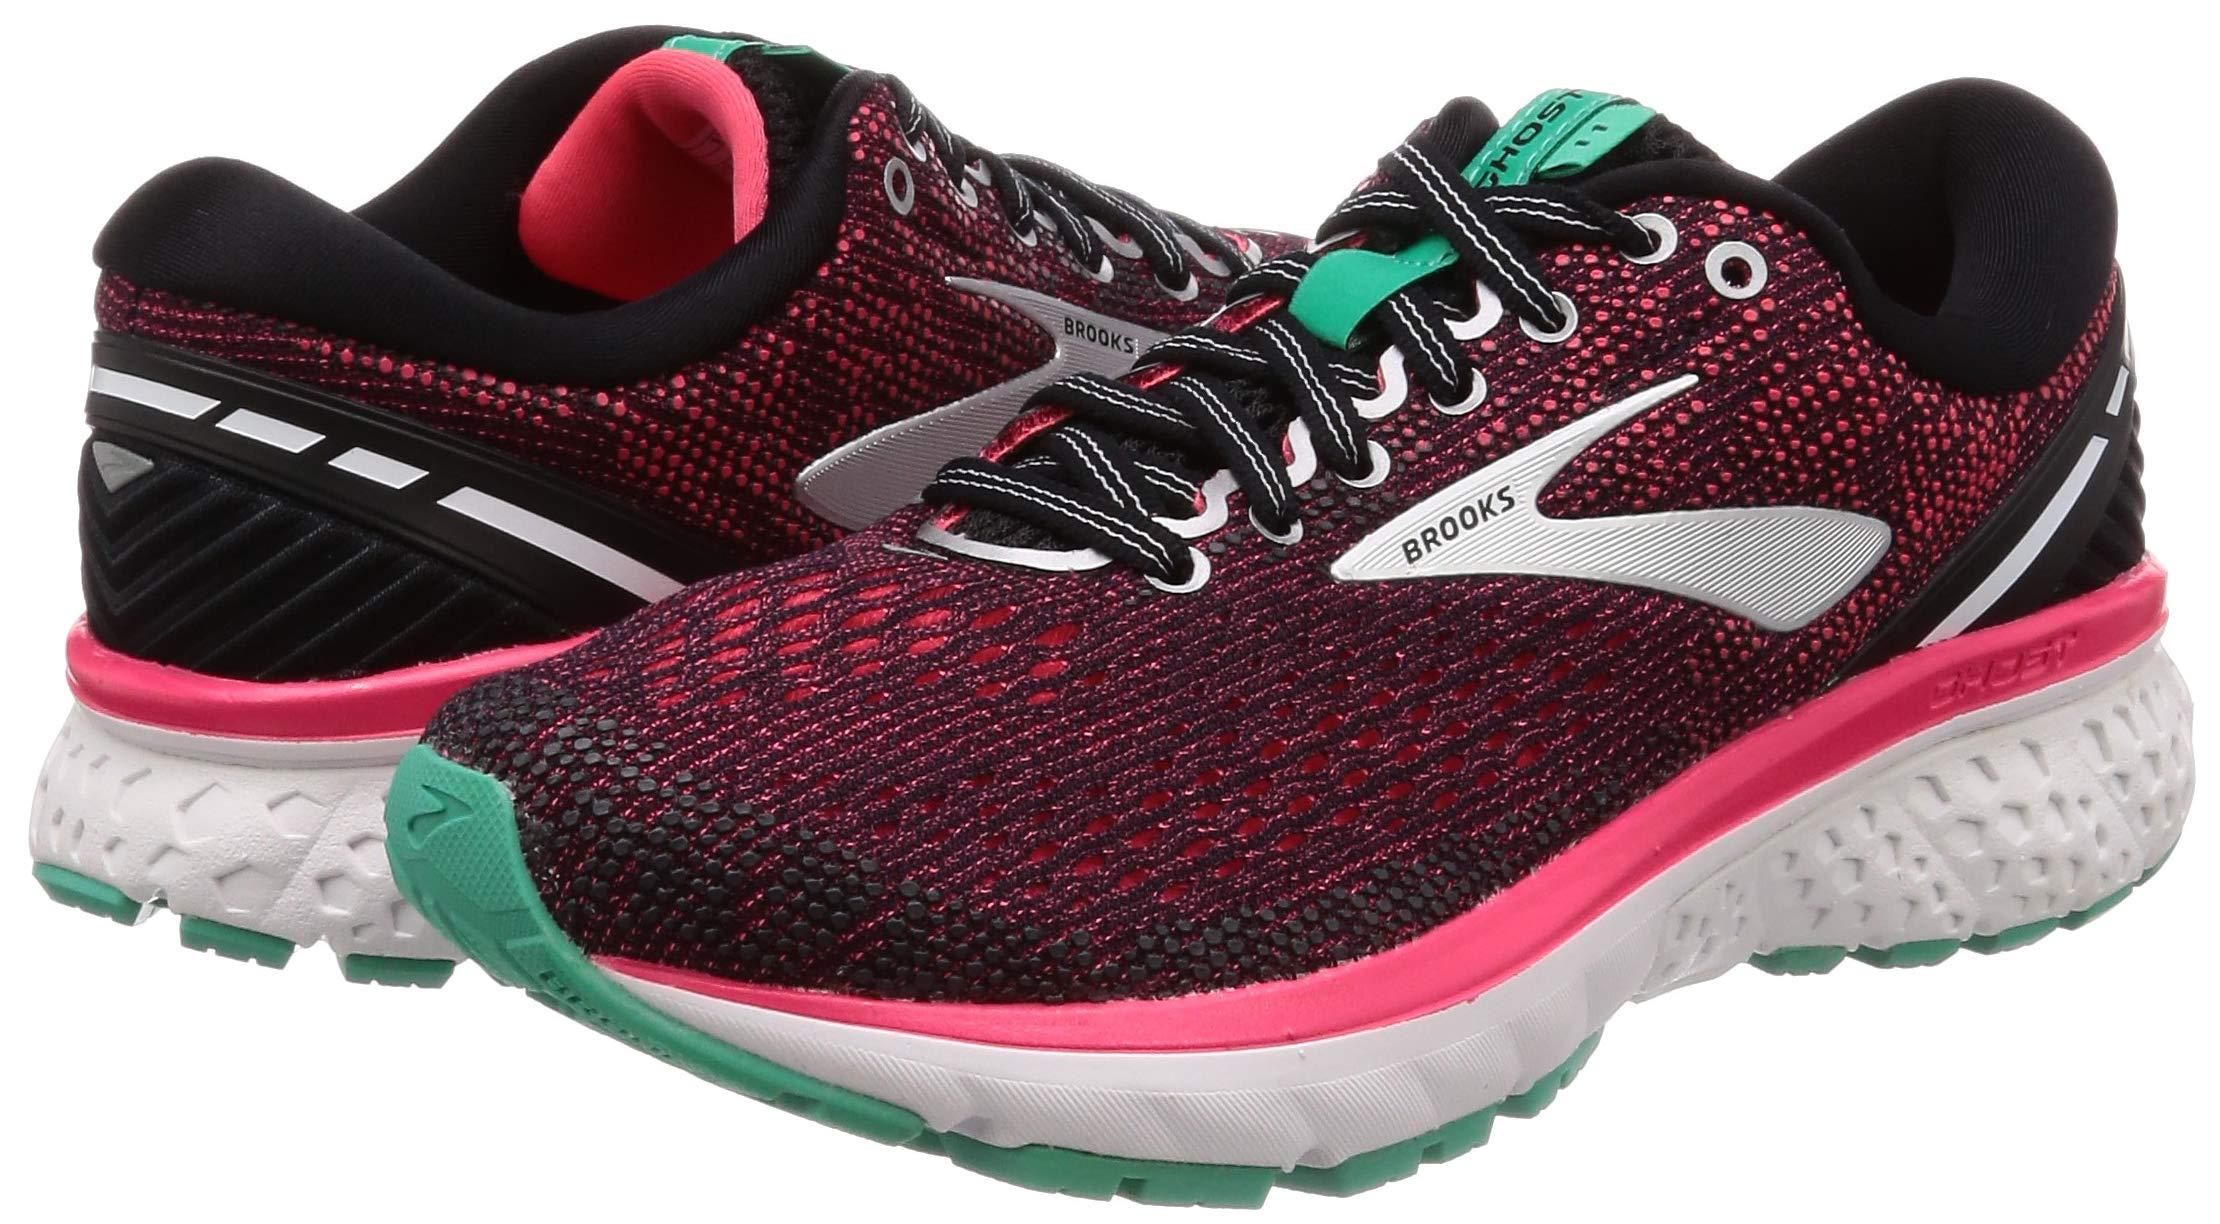 Brooks Womens Ghost 11 Running Shoe - Black/Pink/Aqua - D - 5.0 by Brooks (Image #5)